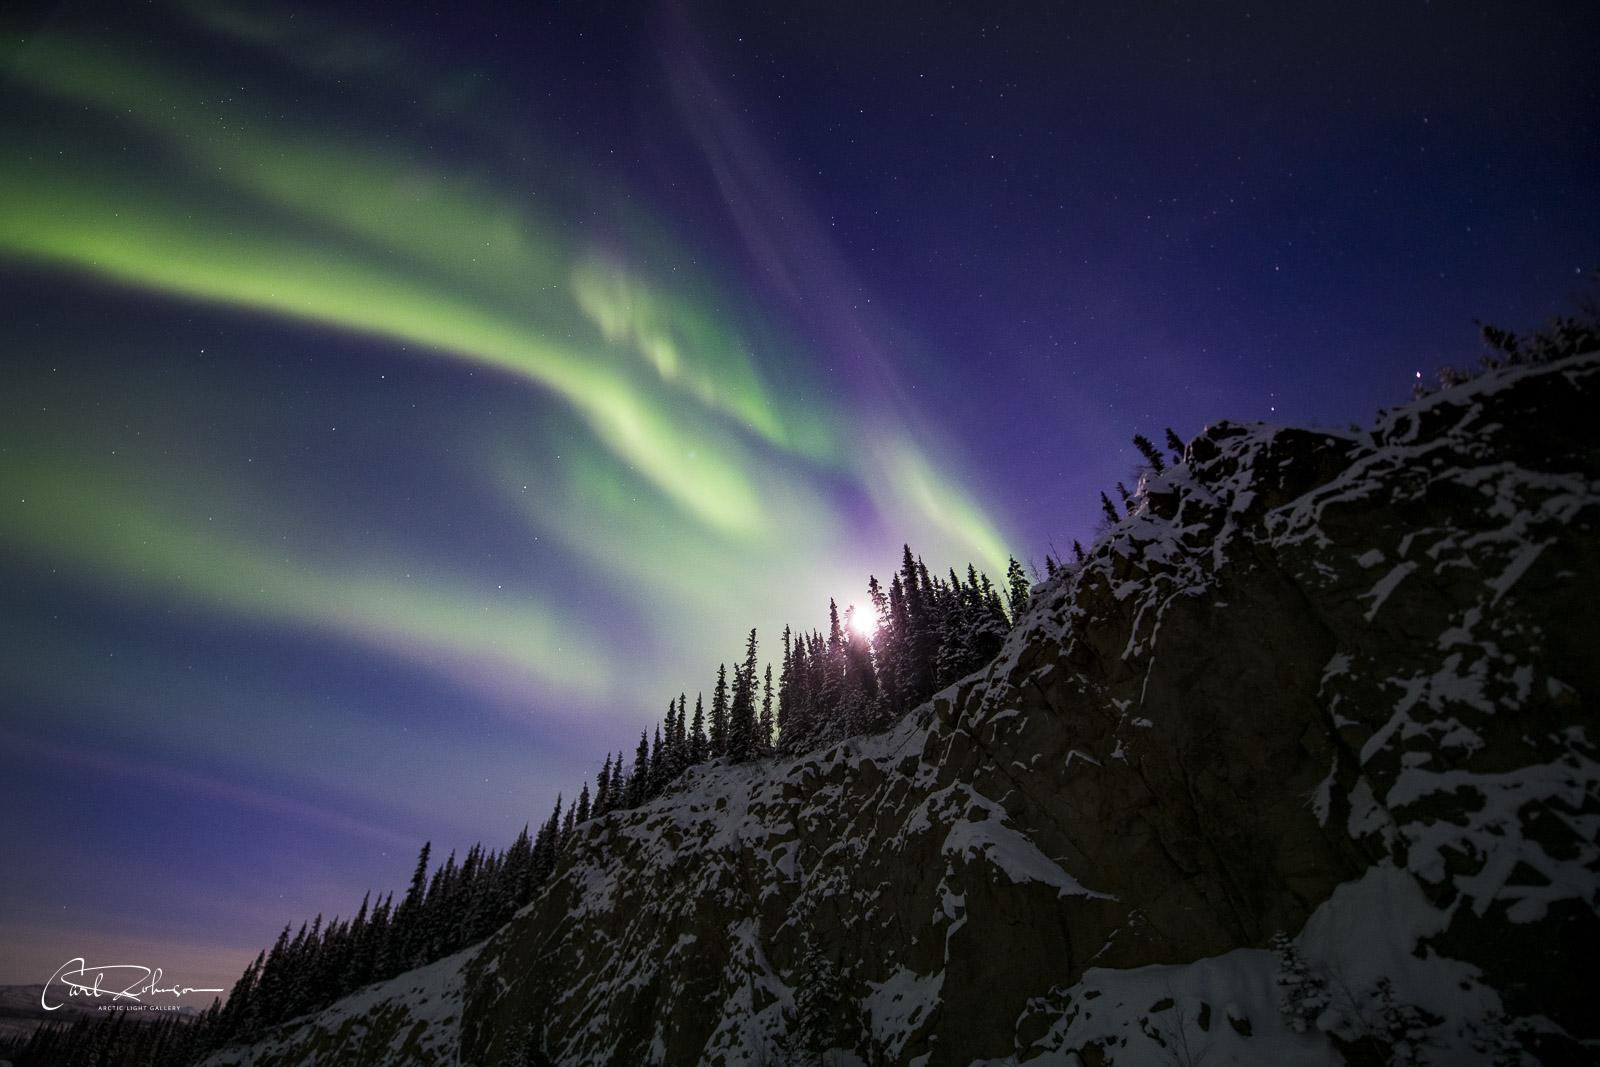 The aurora borealis and moon seem to climb up over a rocky hillside along the Dalton Highway.